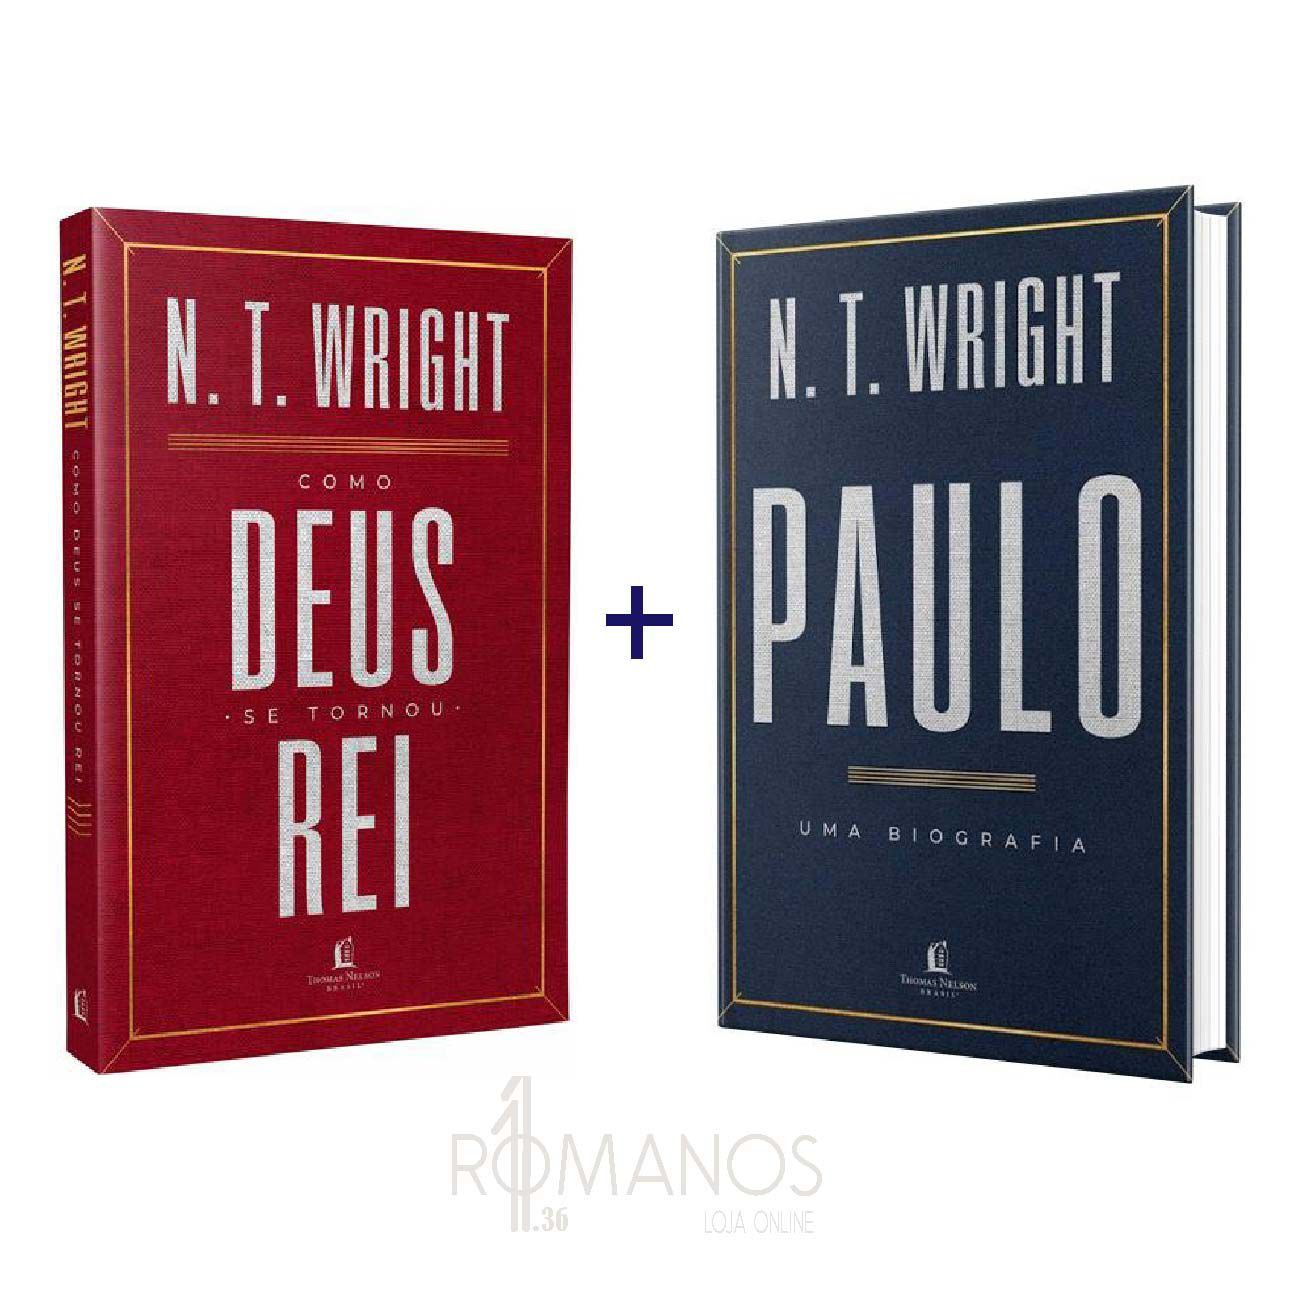 Kit Como Deus se Tornou Rei + Paulo: Uma Biografia - N.T Wright